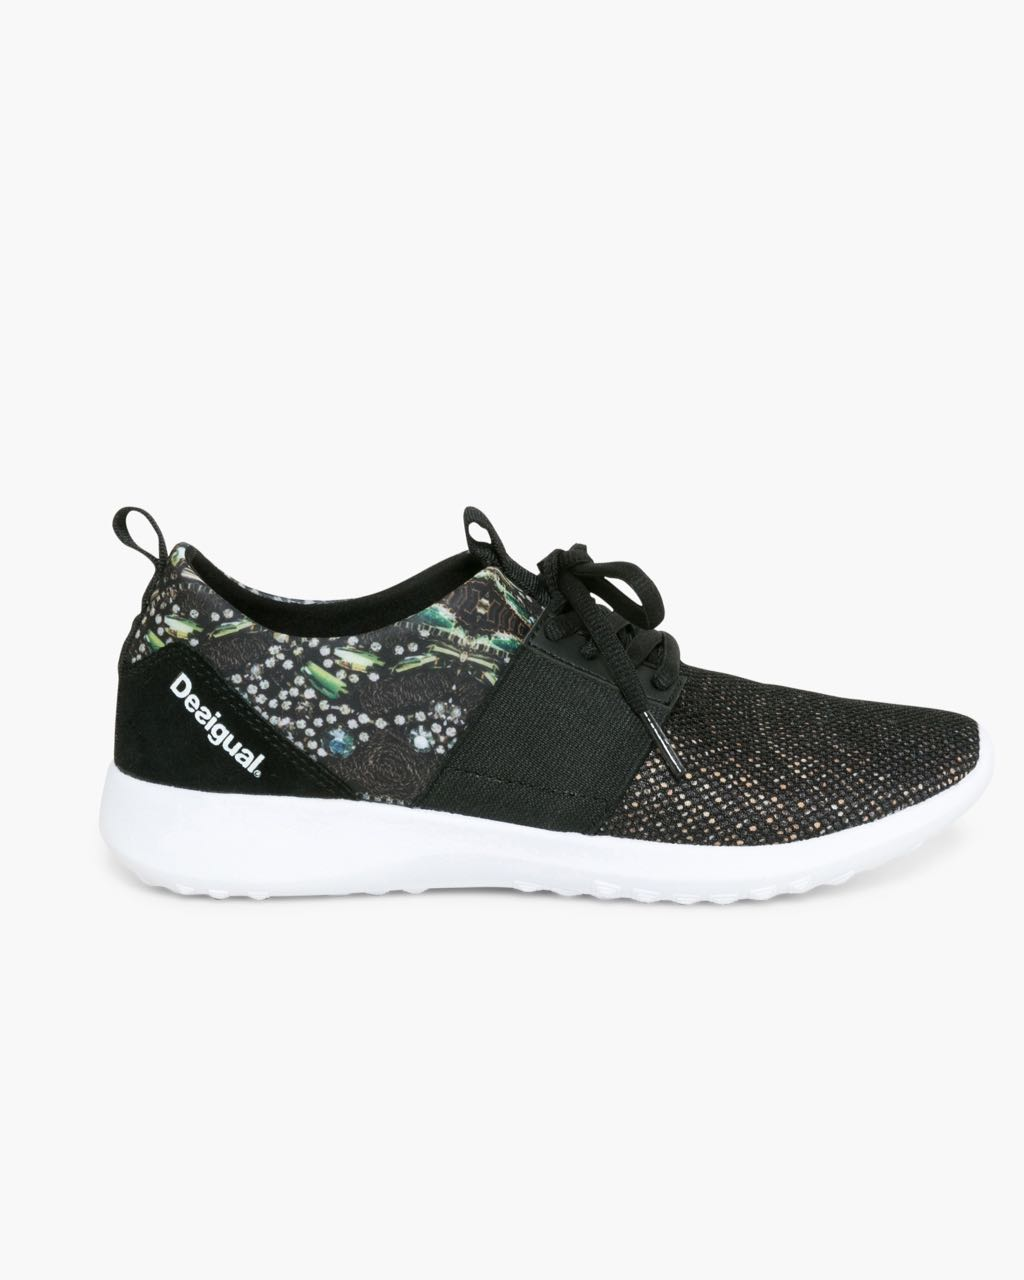 desigual running shoes